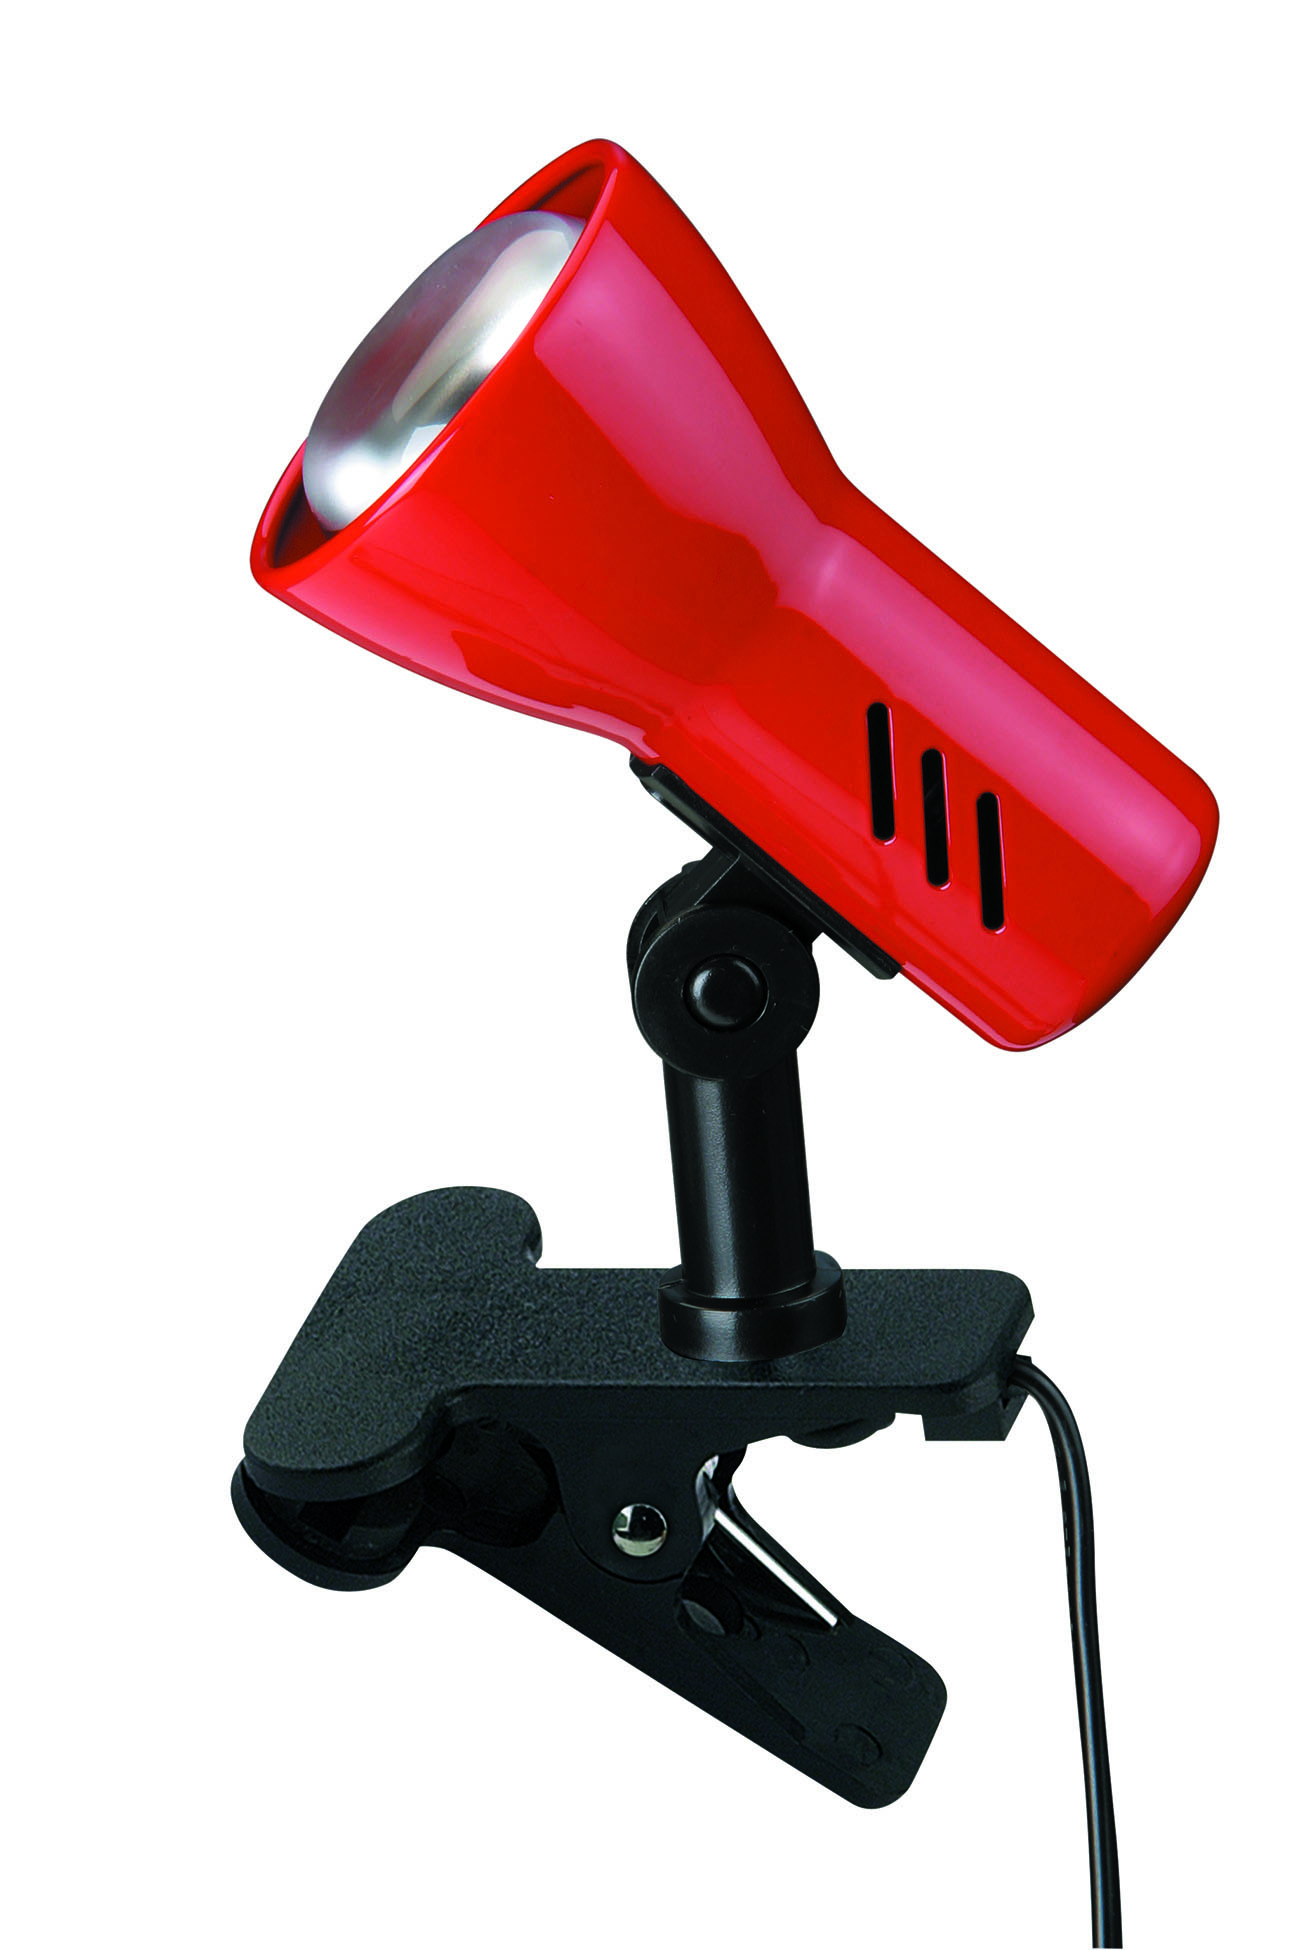 LED Klemmleuchte, 6,5 cm, max. 40 W, Rot